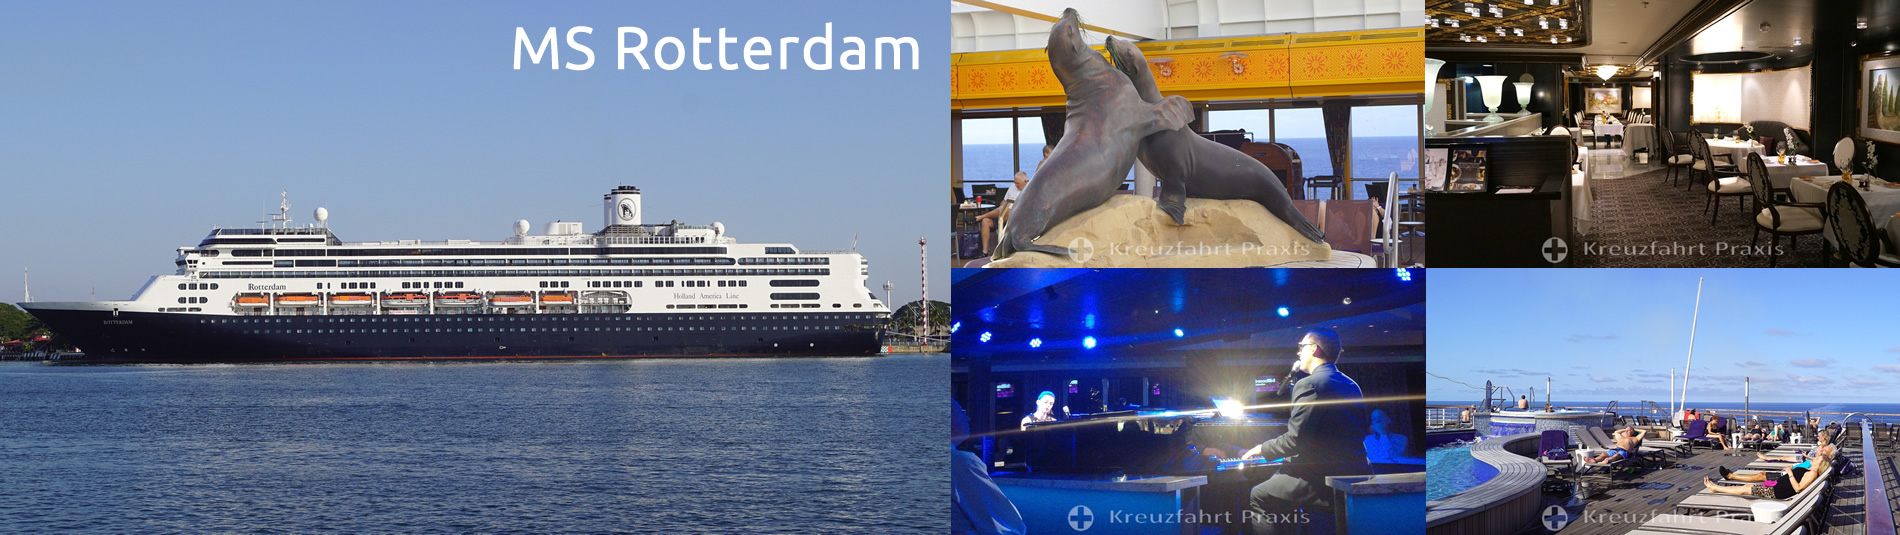 ms rotterdam kreuzfahrtschiff